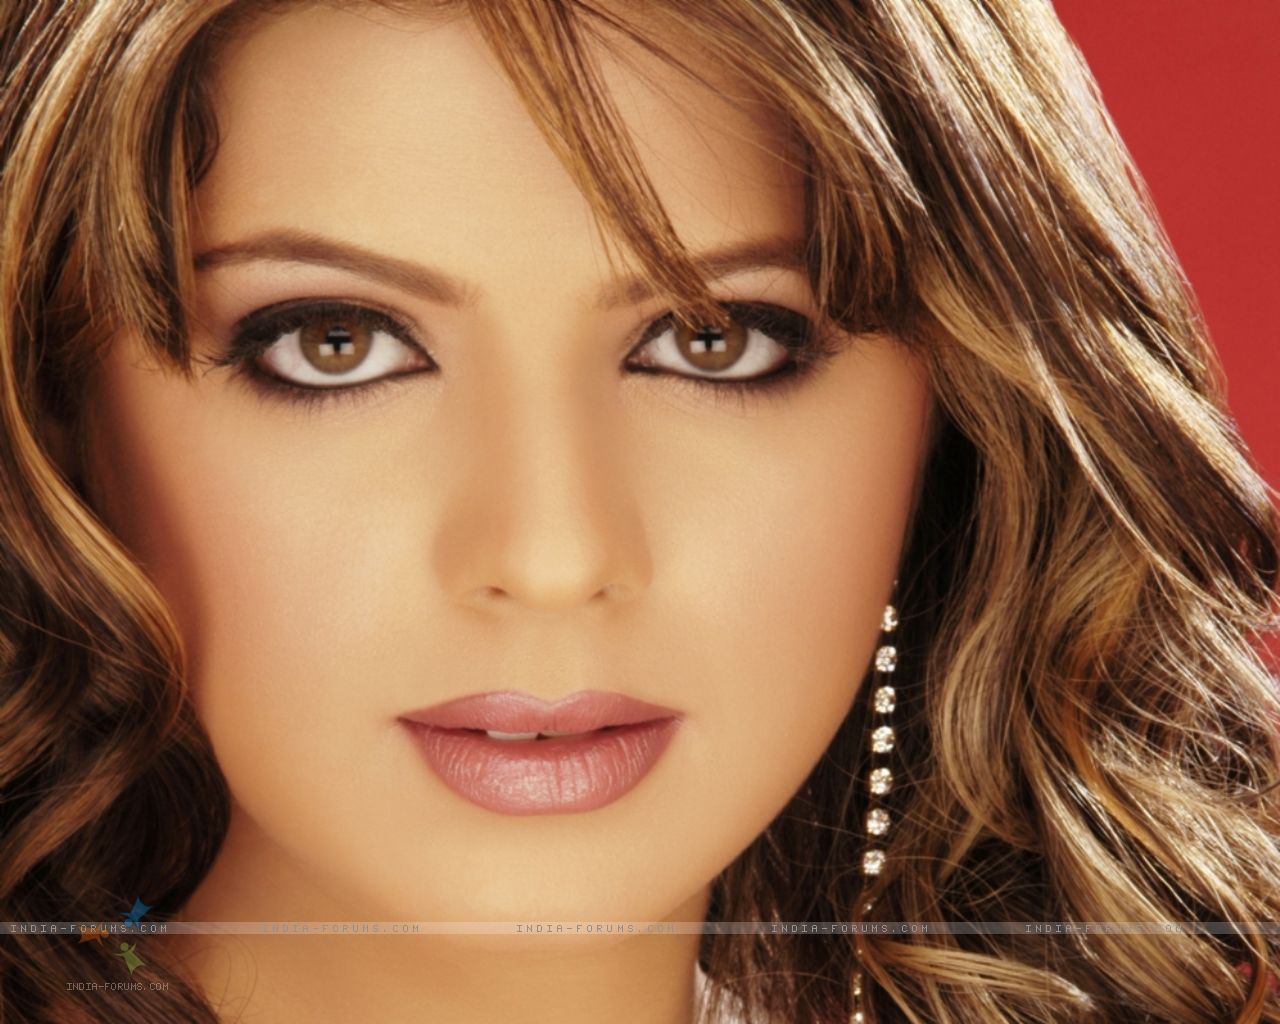 http://3.bp.blogspot.com/-kzWtkgJD9Yg/TfomdCzNXOI/AAAAAAAAAZU/moJIUM1v59g/s1600/Rucha+Gujarati+Wallpaper13.jpg